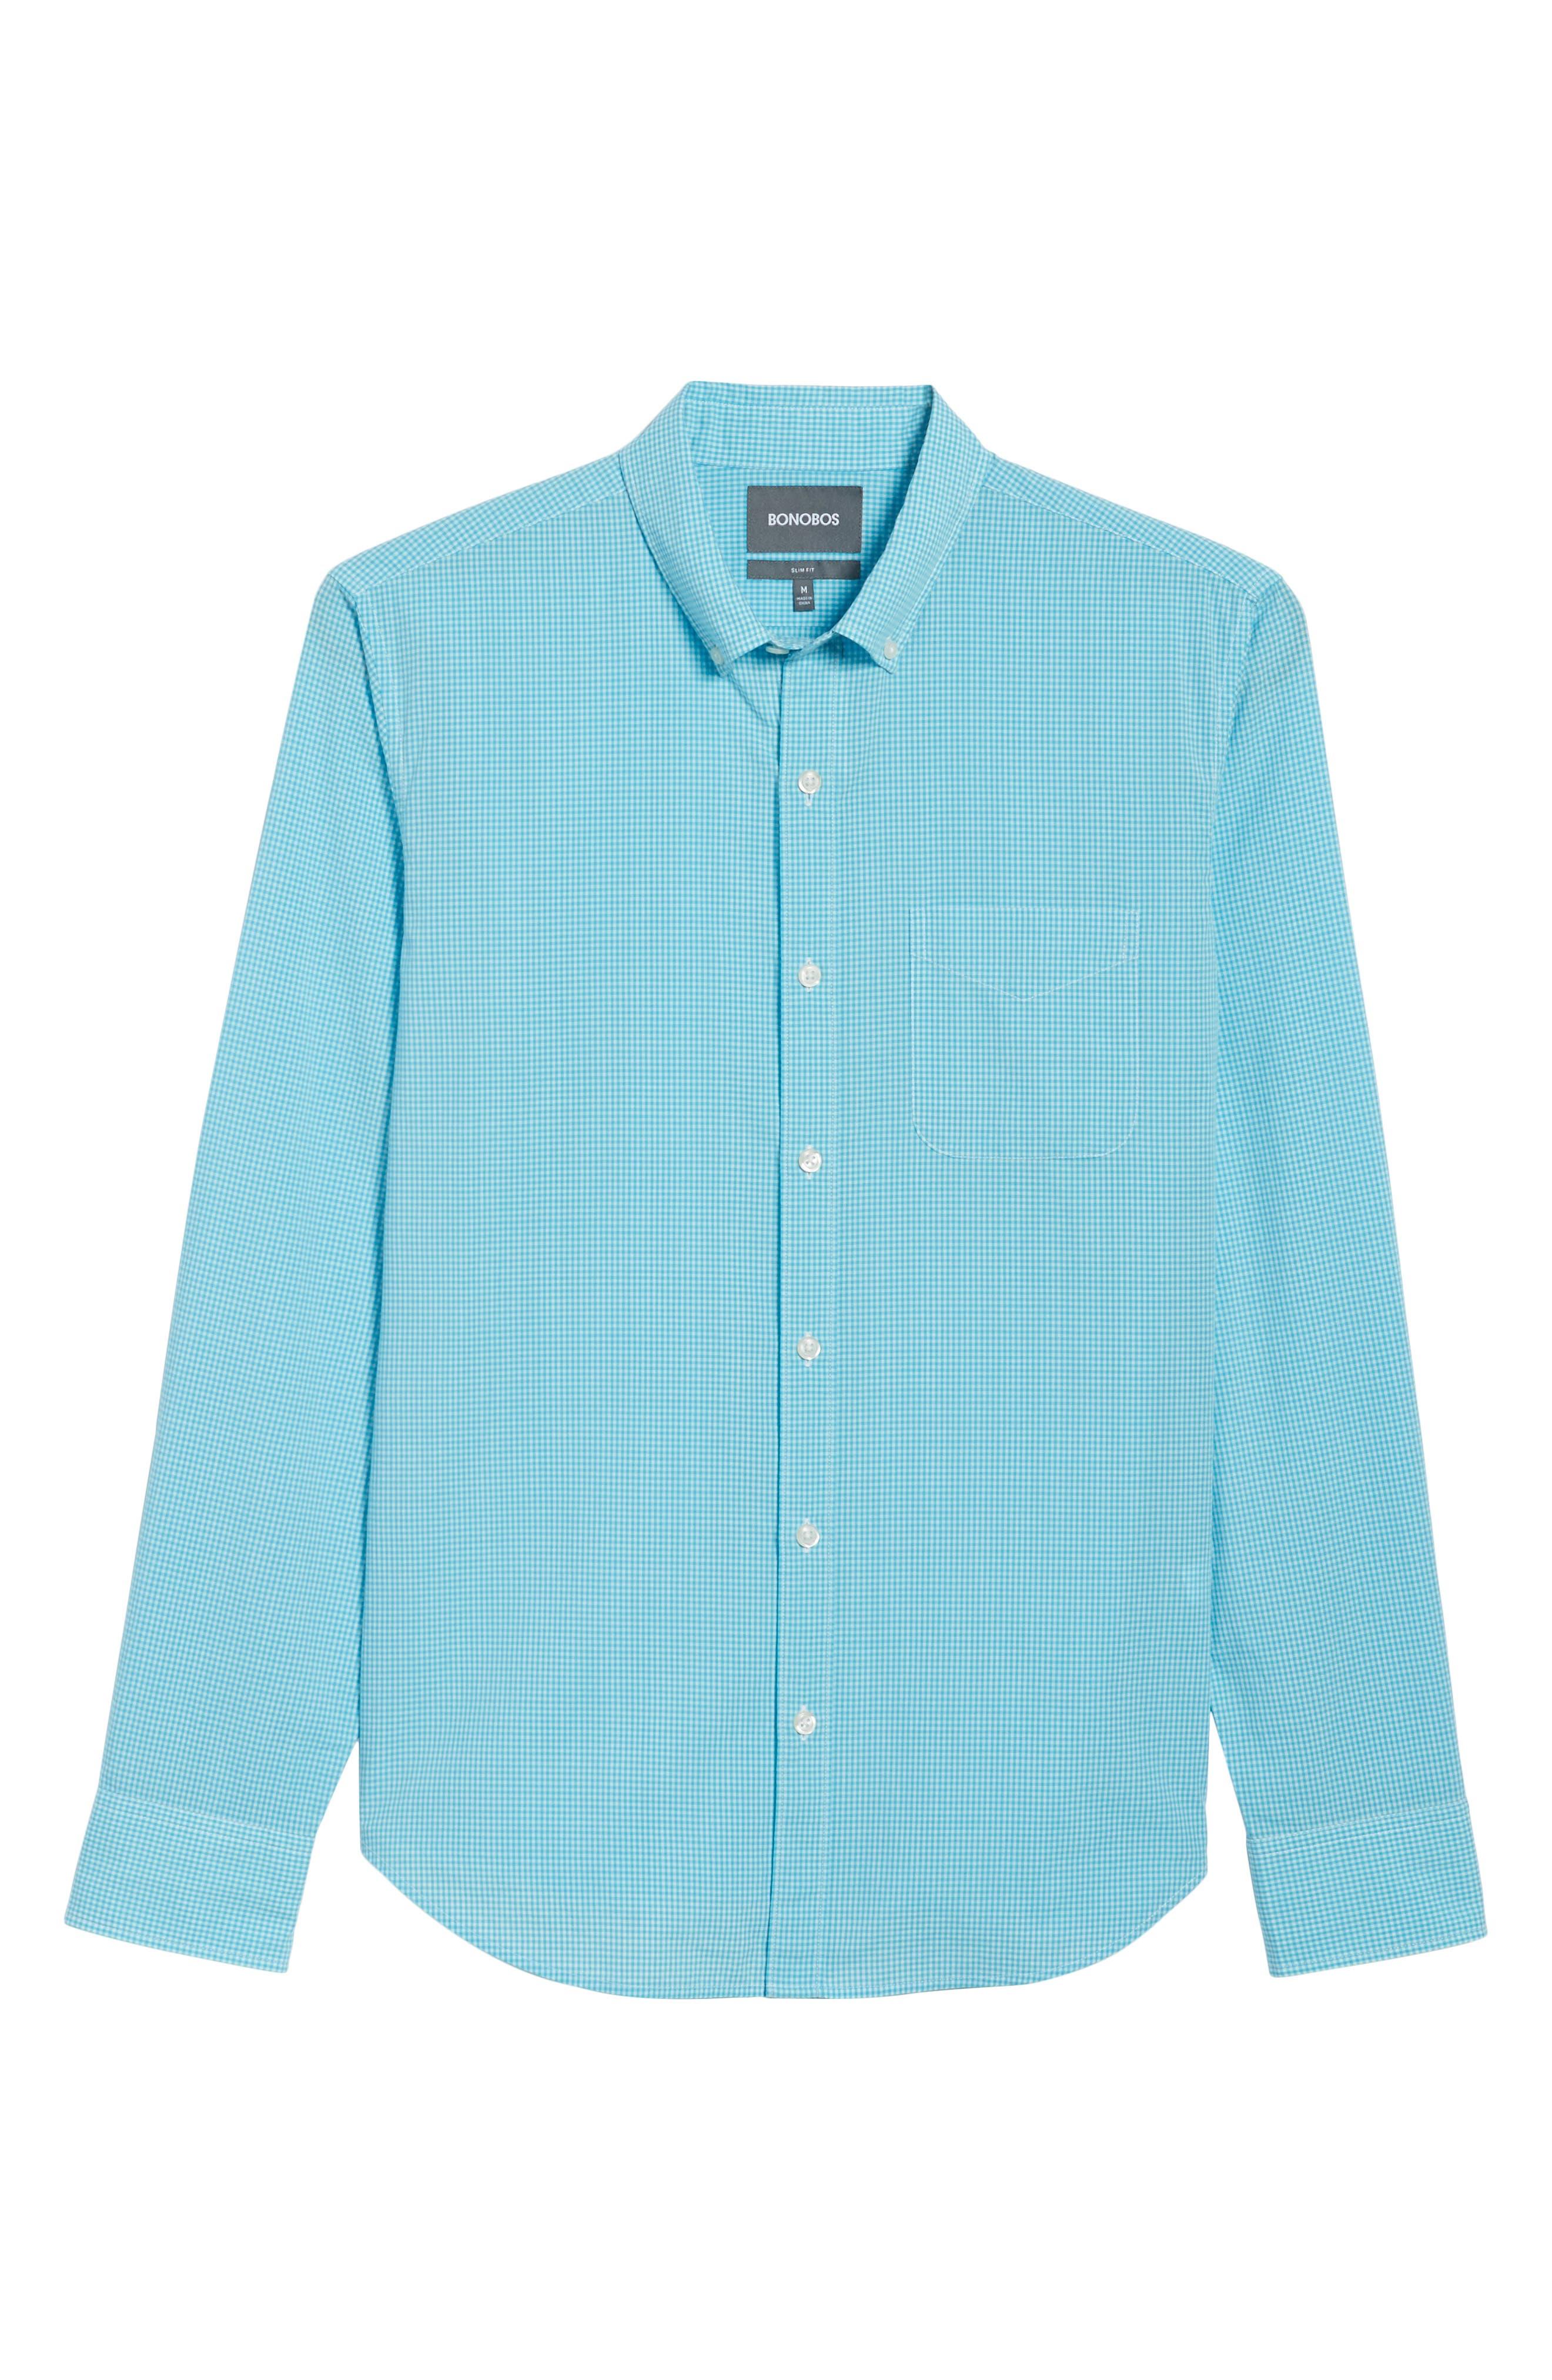 Slim Fit Summerweight Check Sport Shirt,                             Alternate thumbnail 6, color,                             Bondi Gingham - Scuba Blue